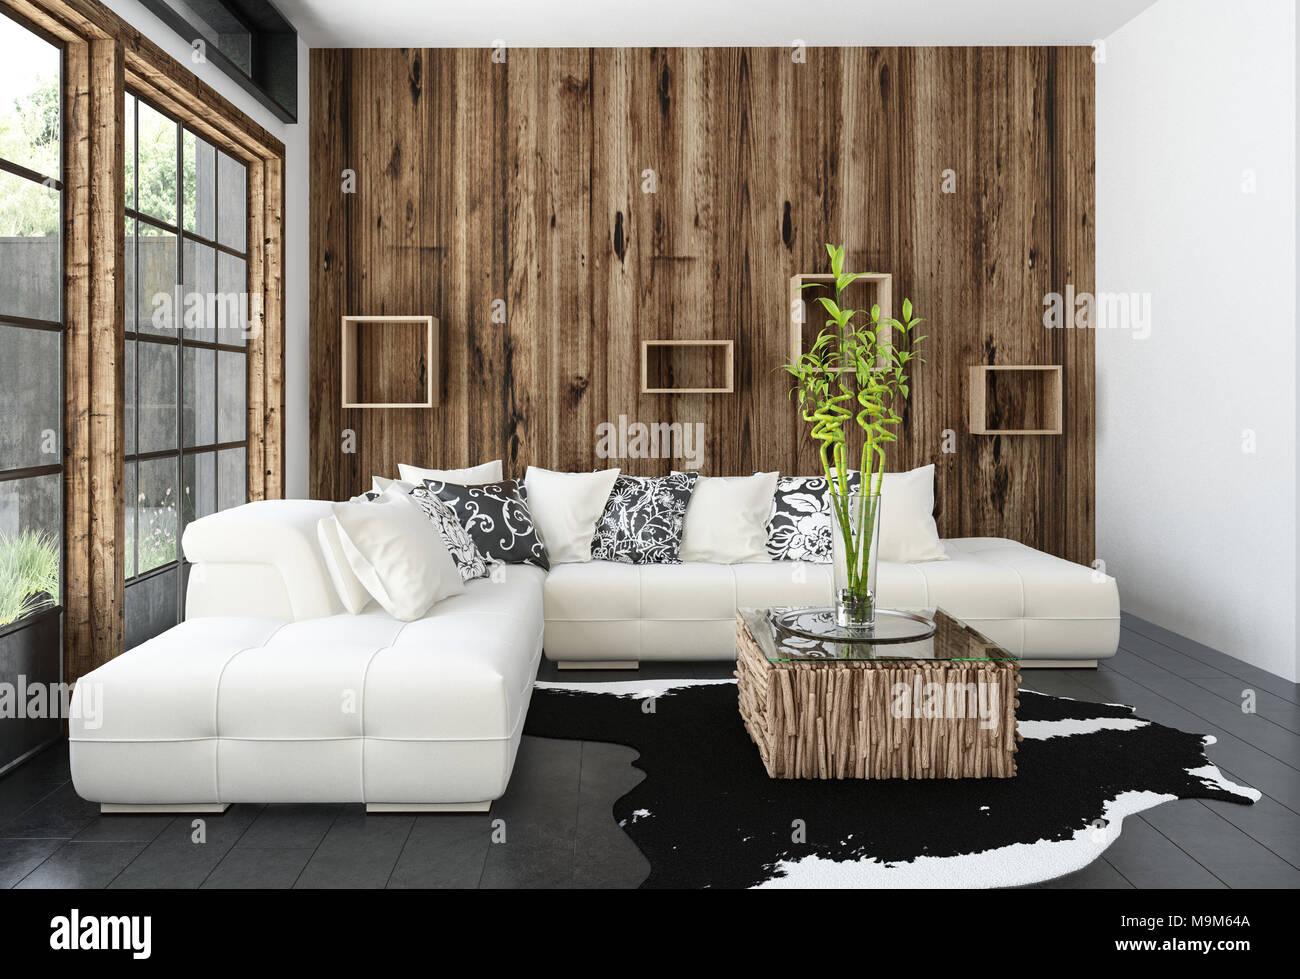 Emejing Salon Moderne Etrustique Contemporary - House Design ...